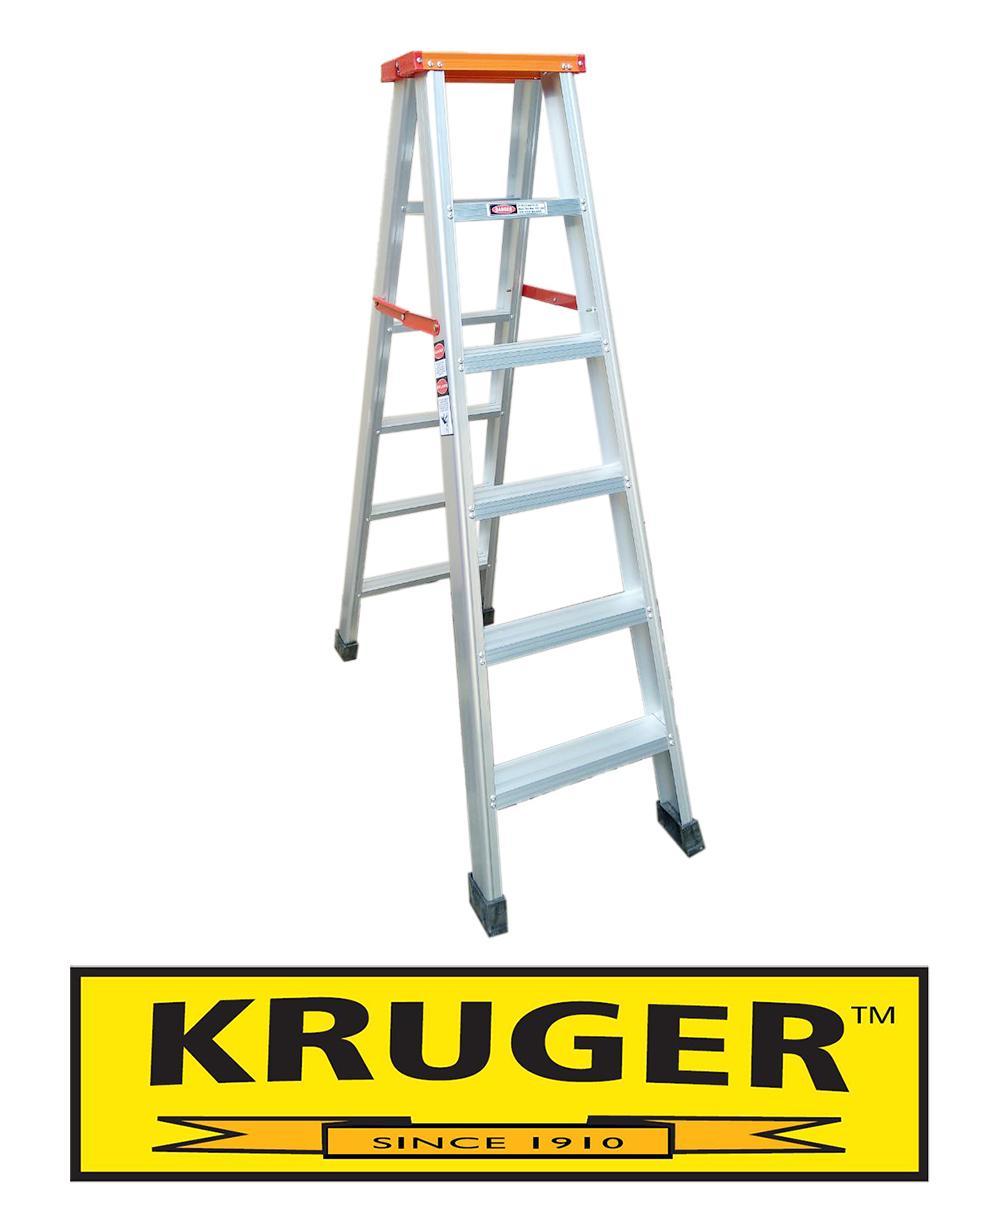 Kruger A-Type Aluminum Ladder, A-12106L (2x6 Steps)